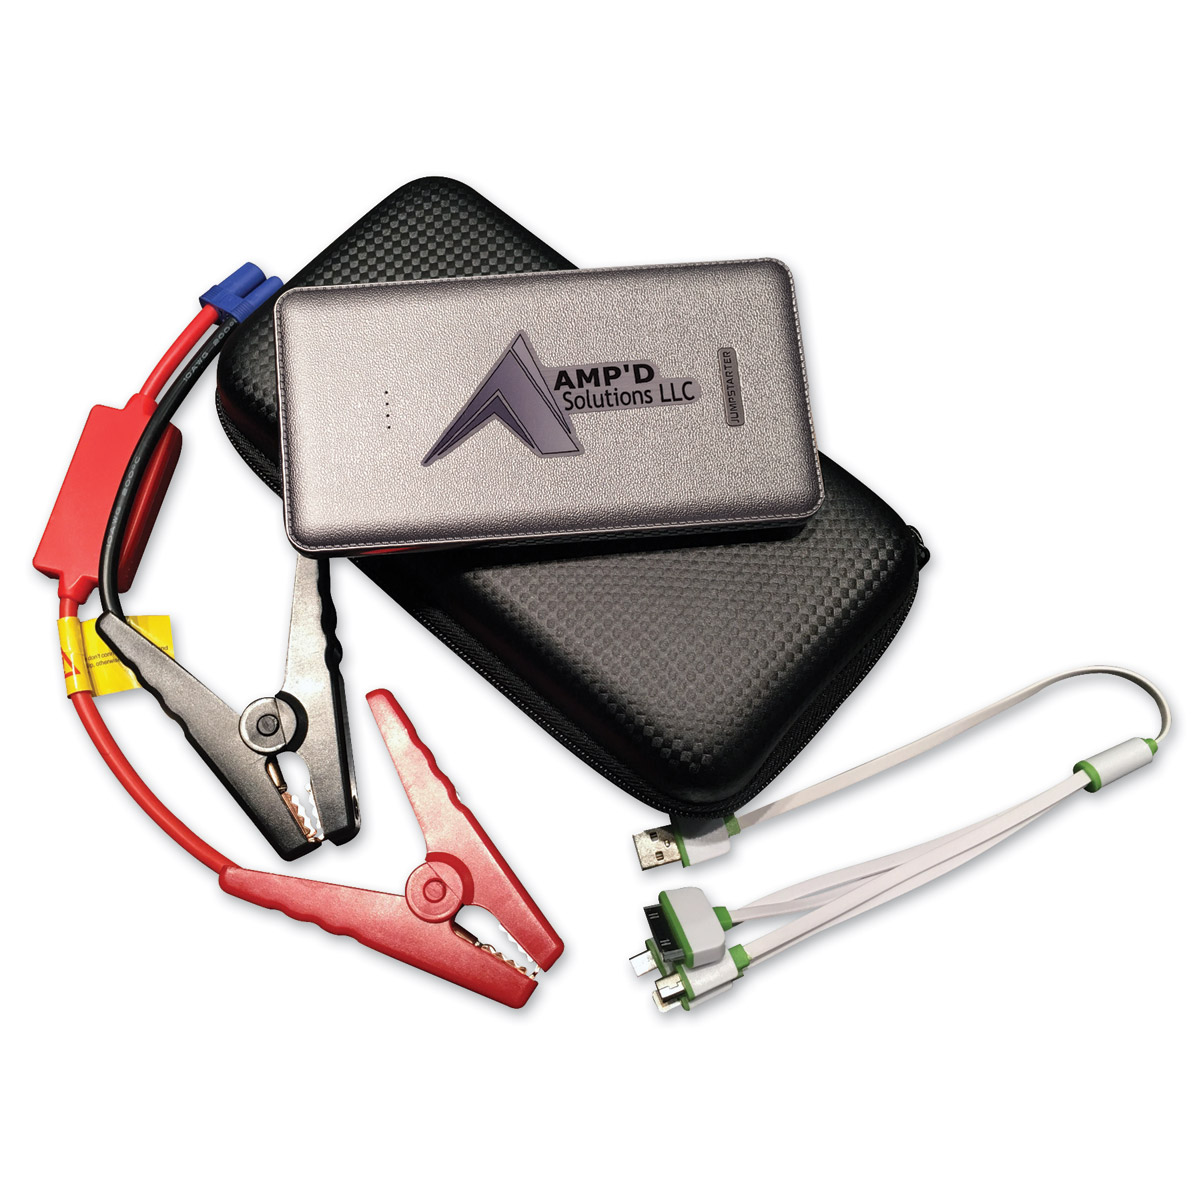 Amp'd Solutions Silver Ultra-Slim Jump Starter